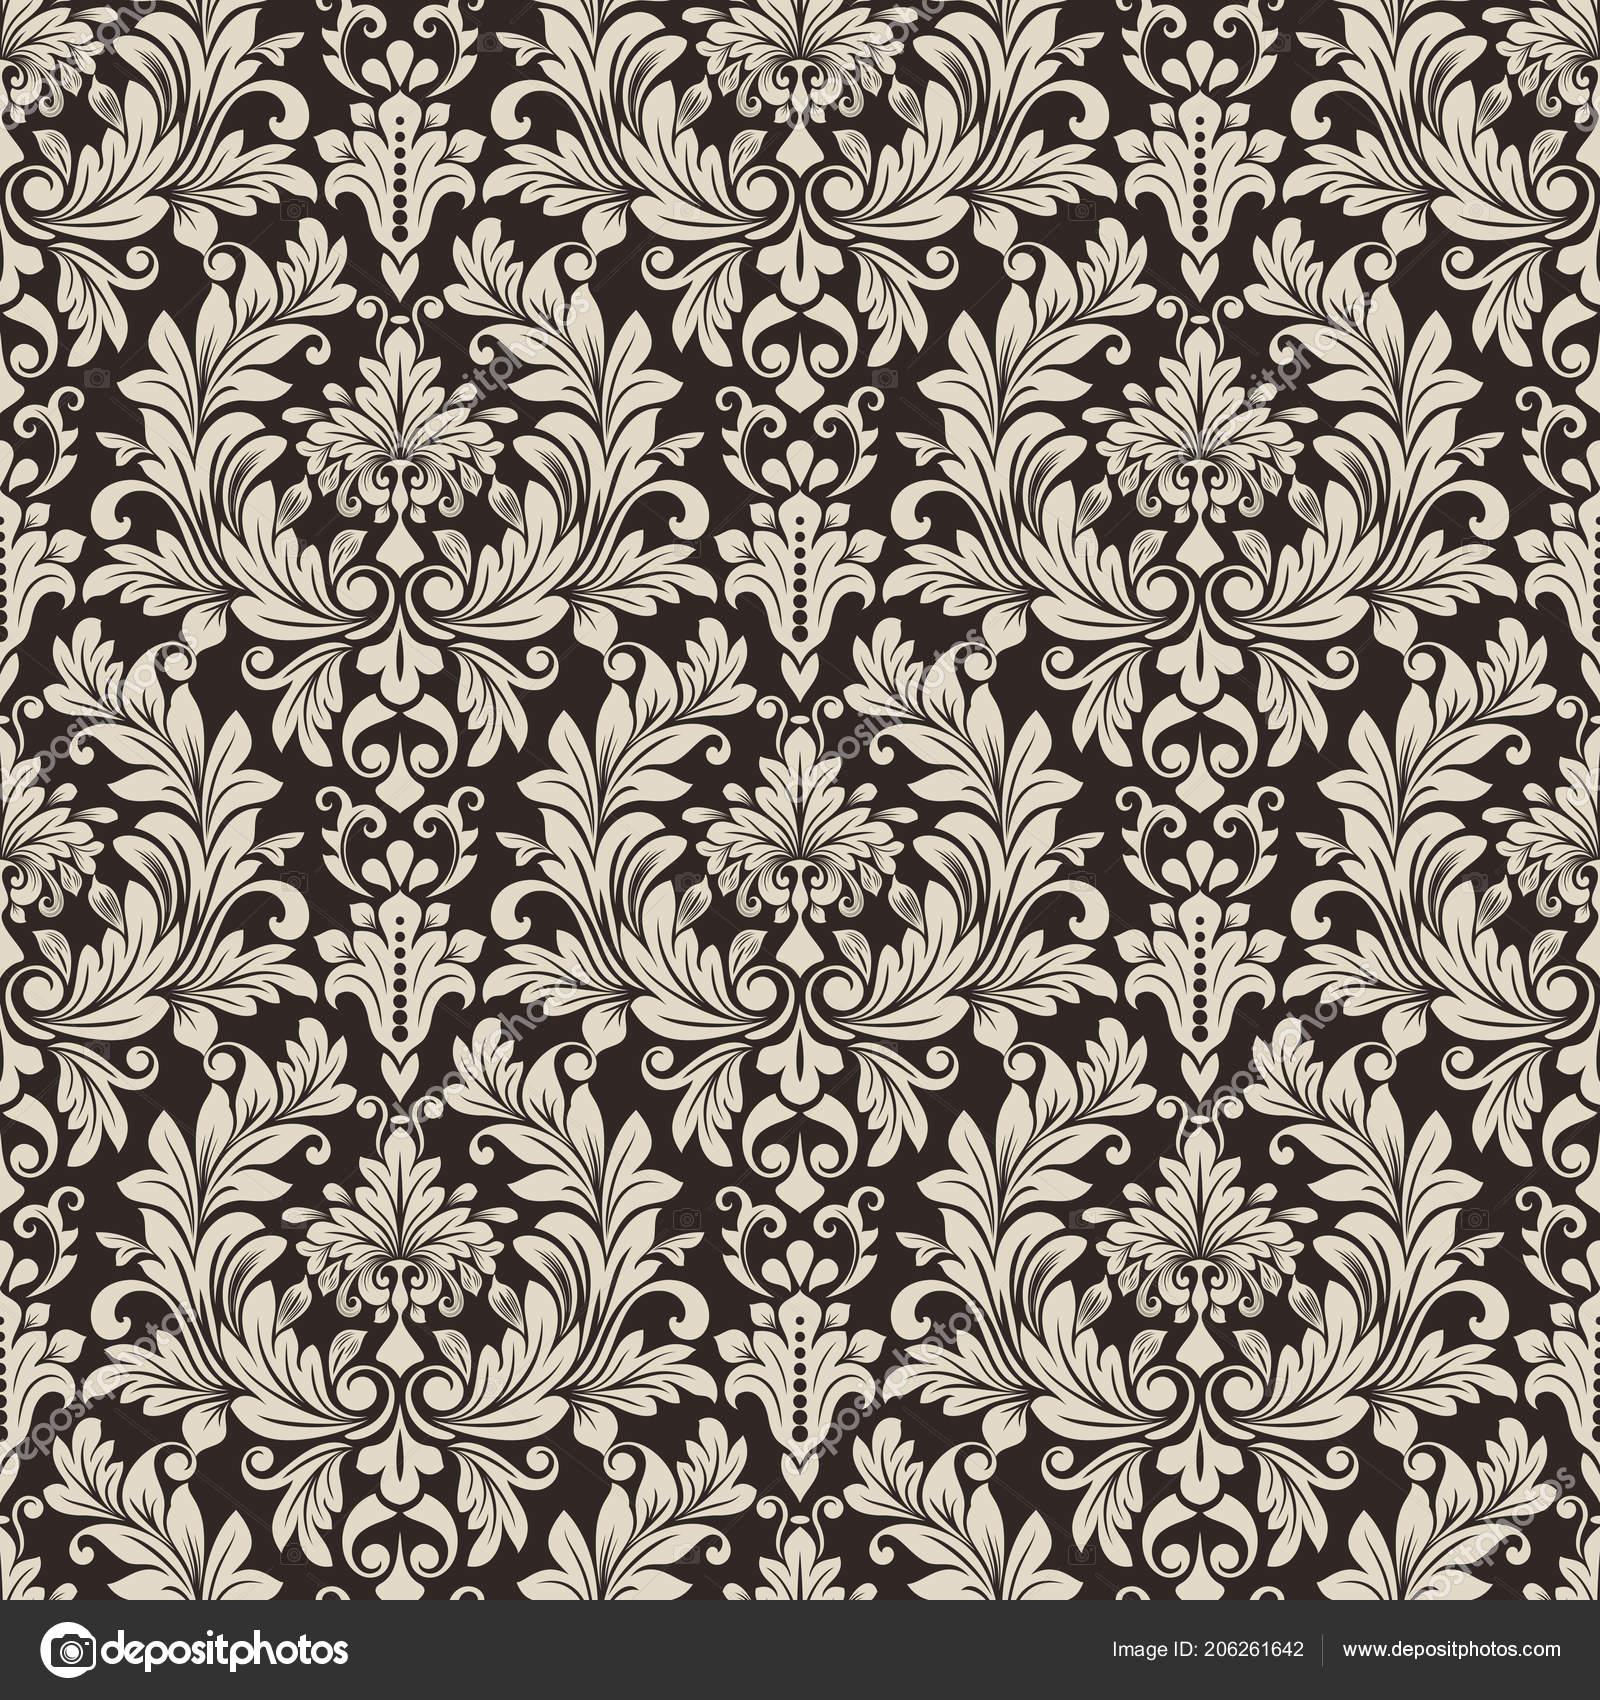 Seamless Black White Floral Wallpaper Vector Background Vintage